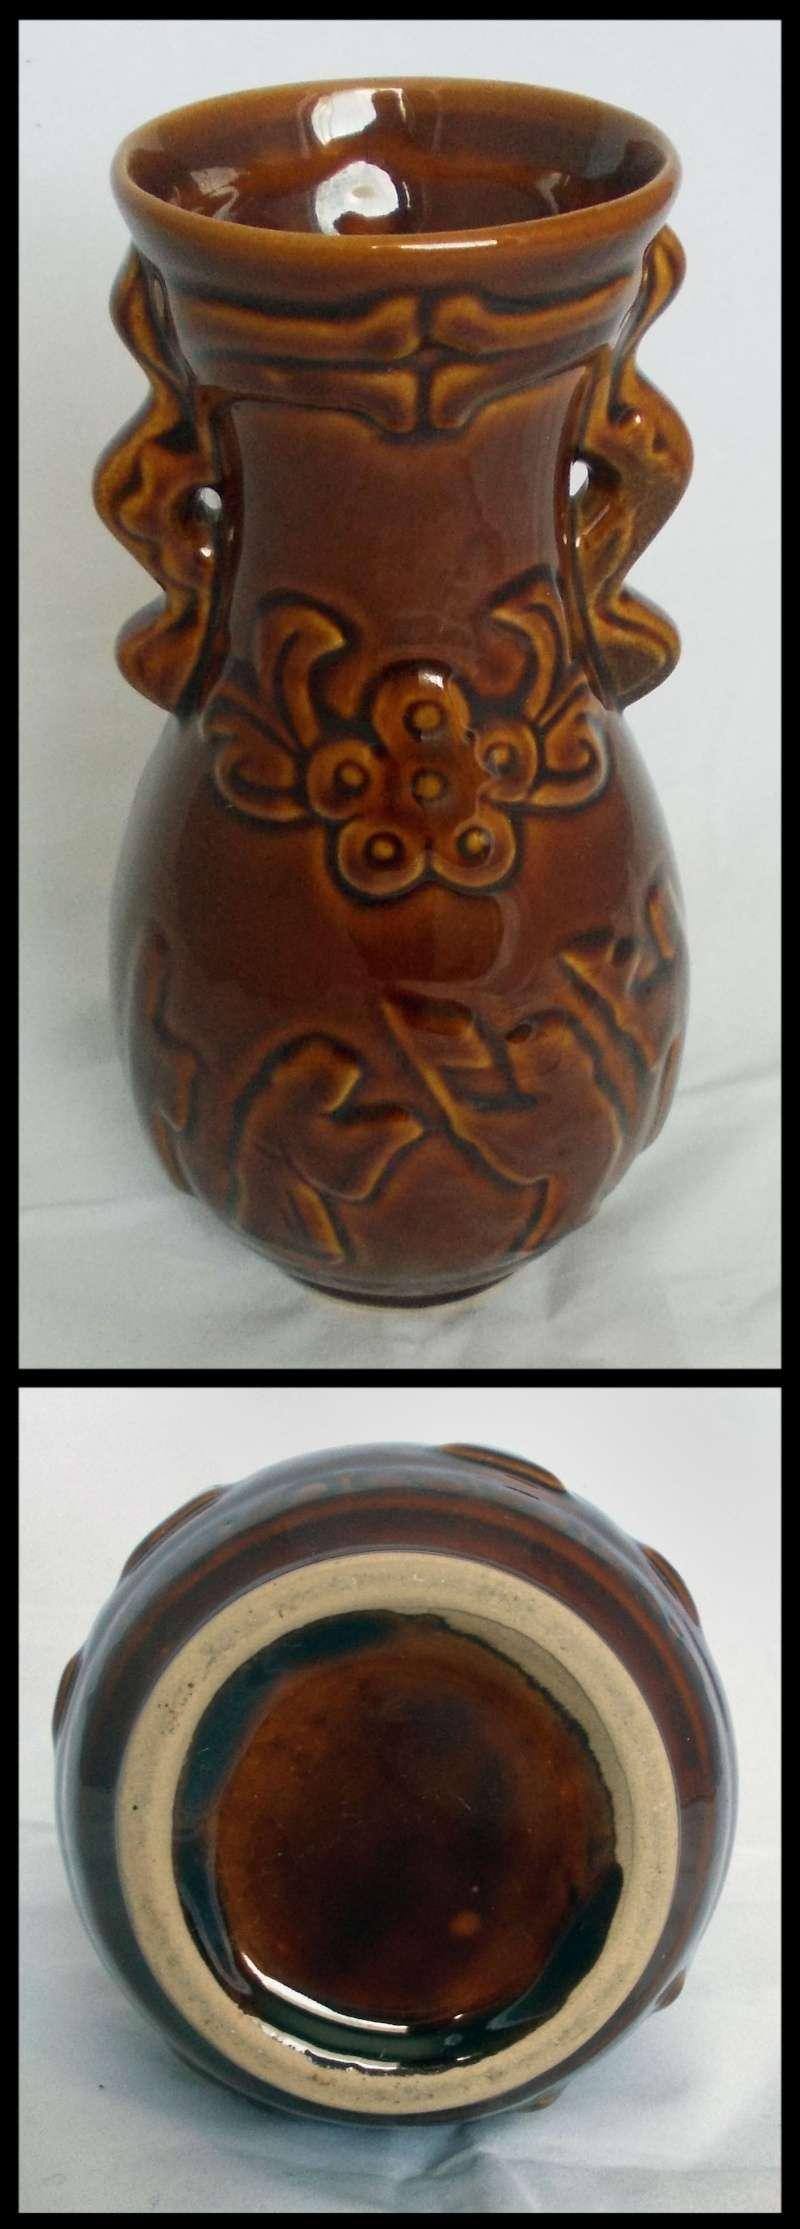 Are both vases Orzel/Aquila made? Dscn6852